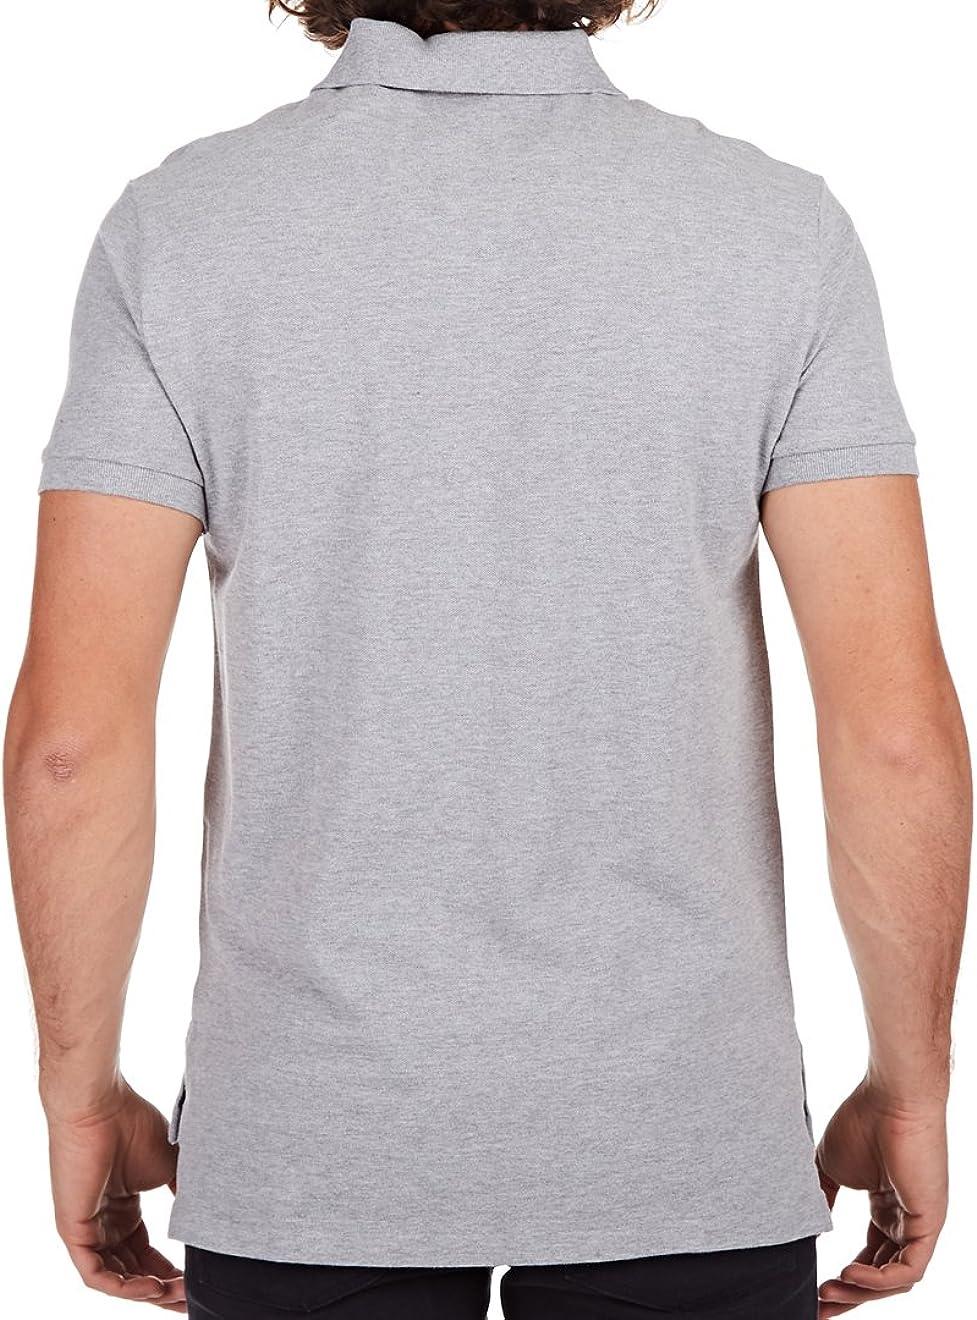 X-Large, Grey Polo Ralph Lauren Men Custom Fit Mesh T-shirt